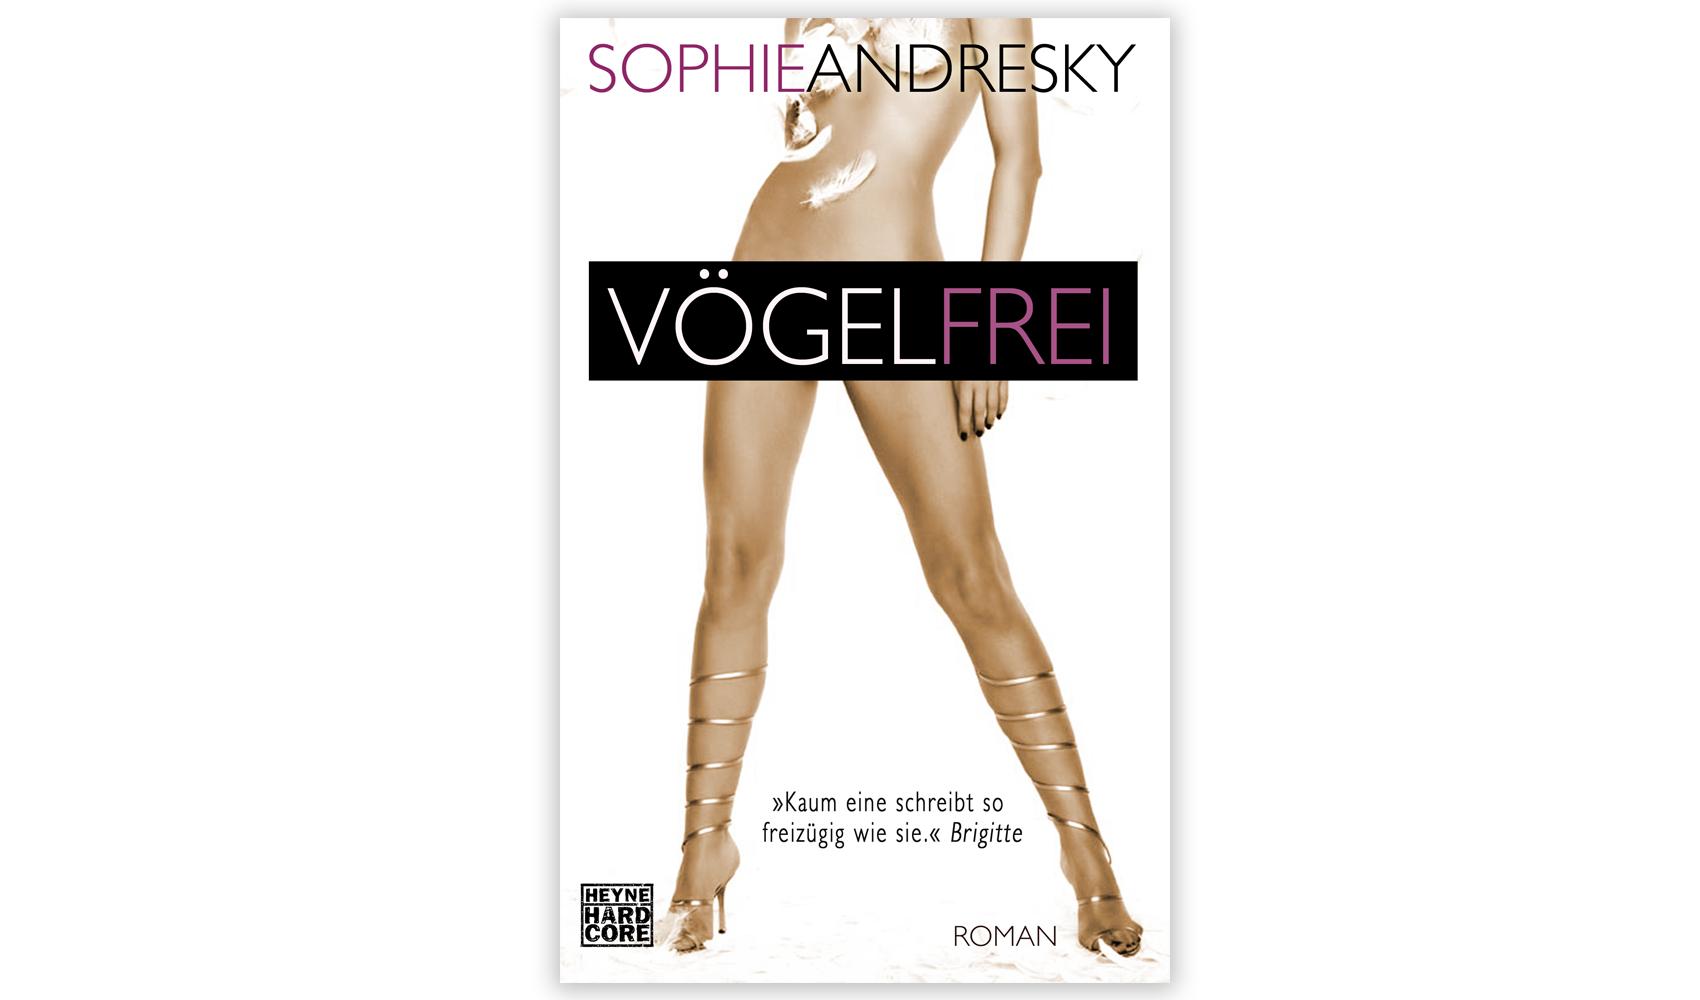 Sophie Andresky Vögelfrei